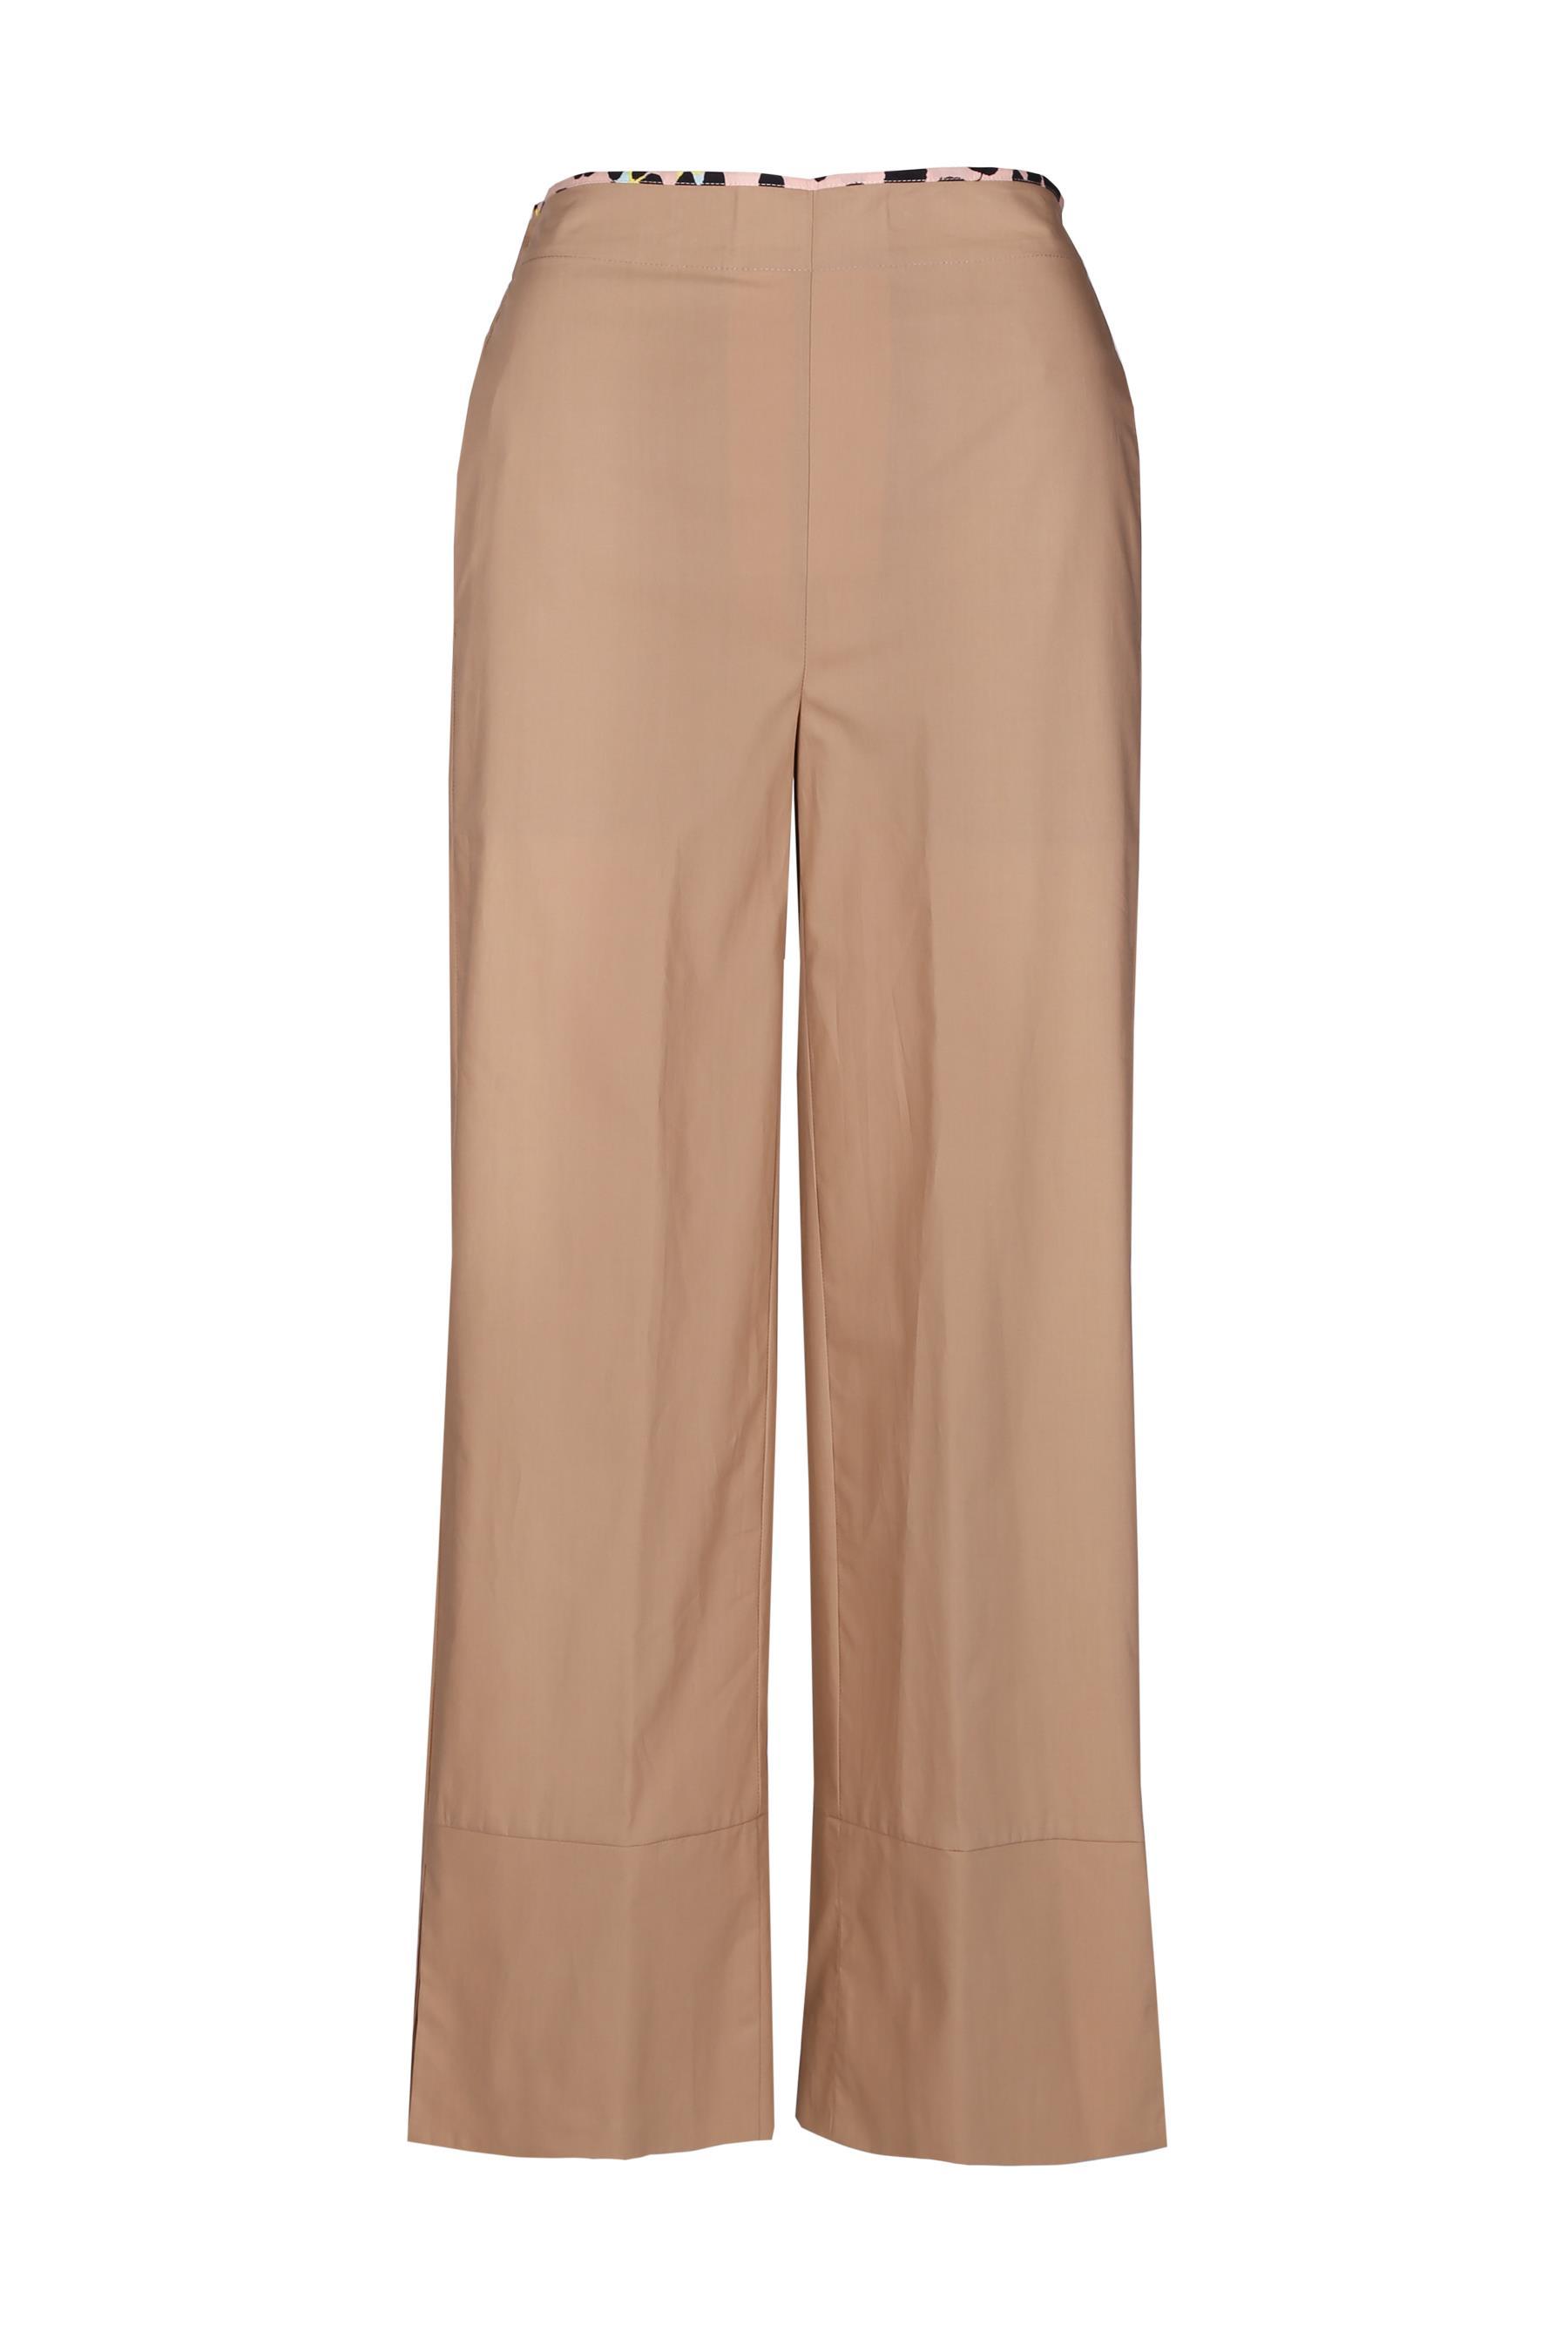 Palace Pants JUCCA | Pants | J2914031/M127